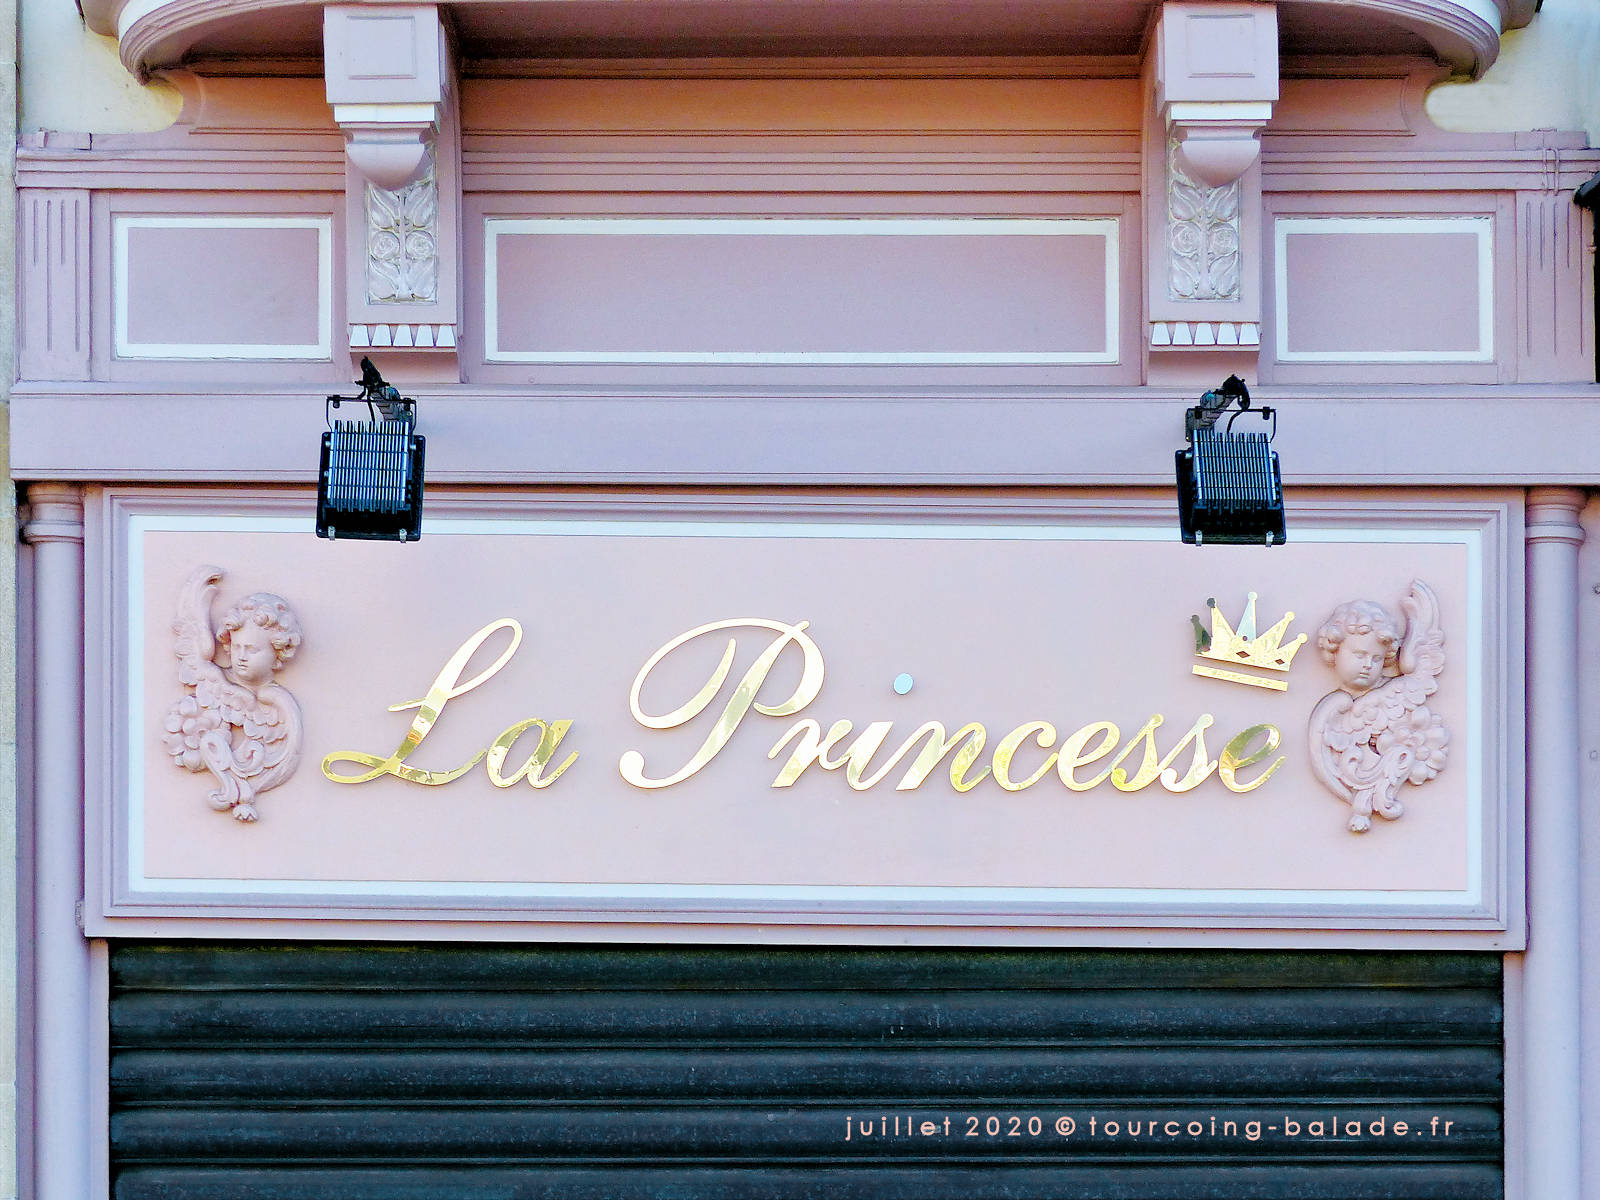 Enseigne La Princesse, Tourcoing Grand Place, 2020